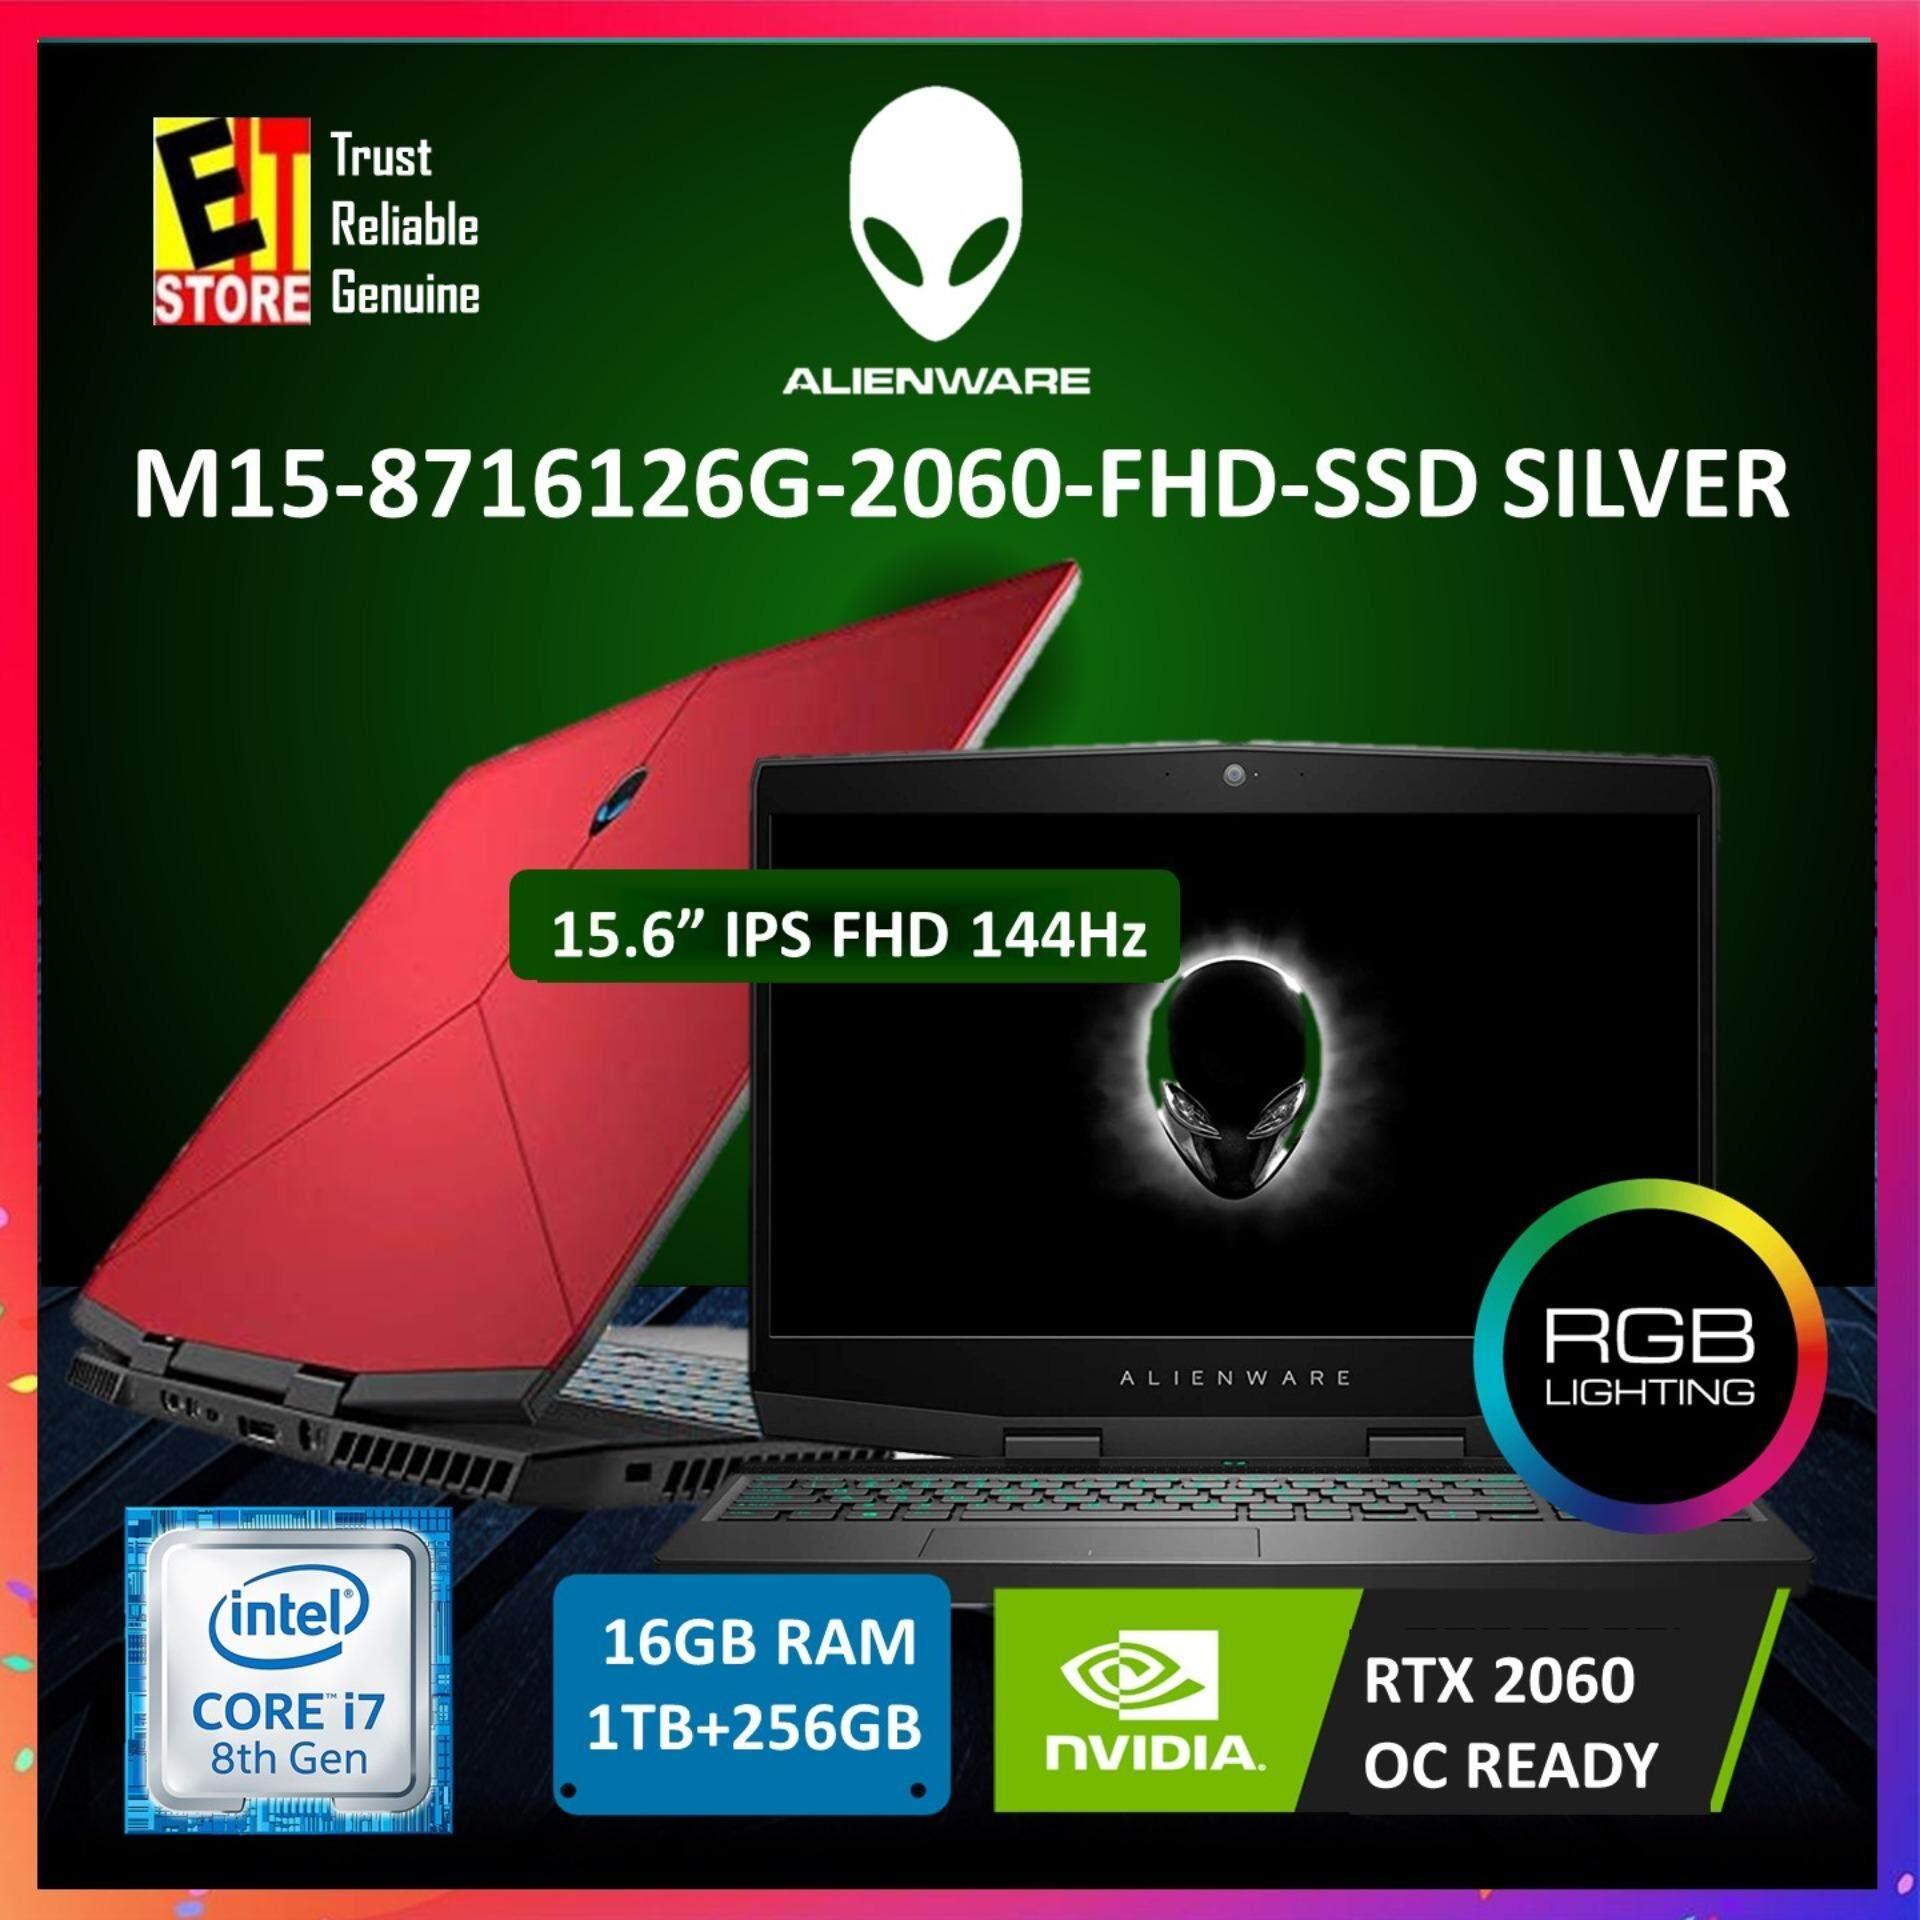 DELL ALIENWARE M15 - M15-8716126G-2060-FHD-SSD-RED (I7-8750H/16GB/1TB+256GB/15.6/RTX2060 6GB/W10/1YR ONSITE) Malaysia